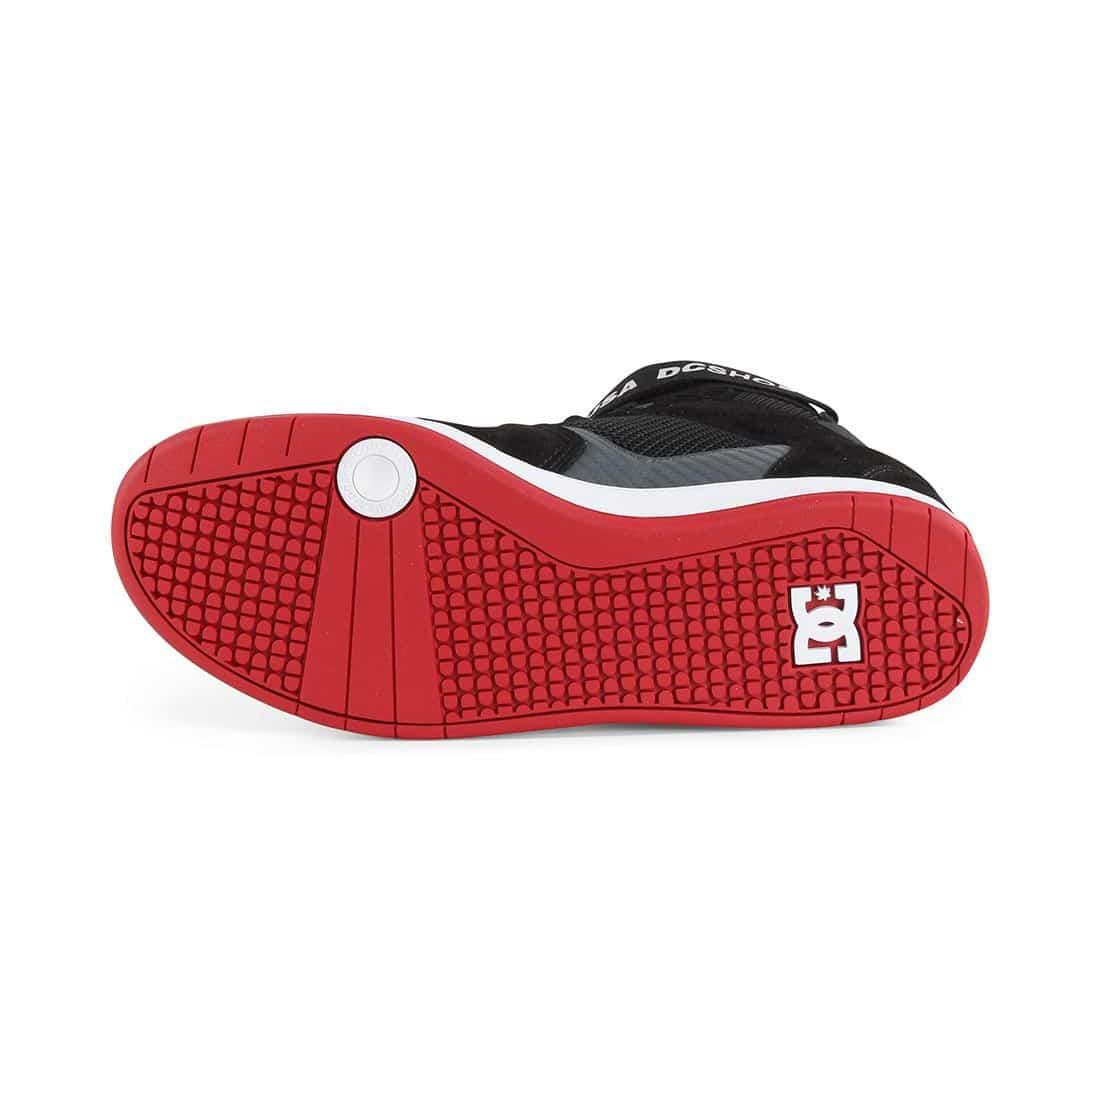 DC Shoes Pensford - Black / Dark Grey / Athletic Red